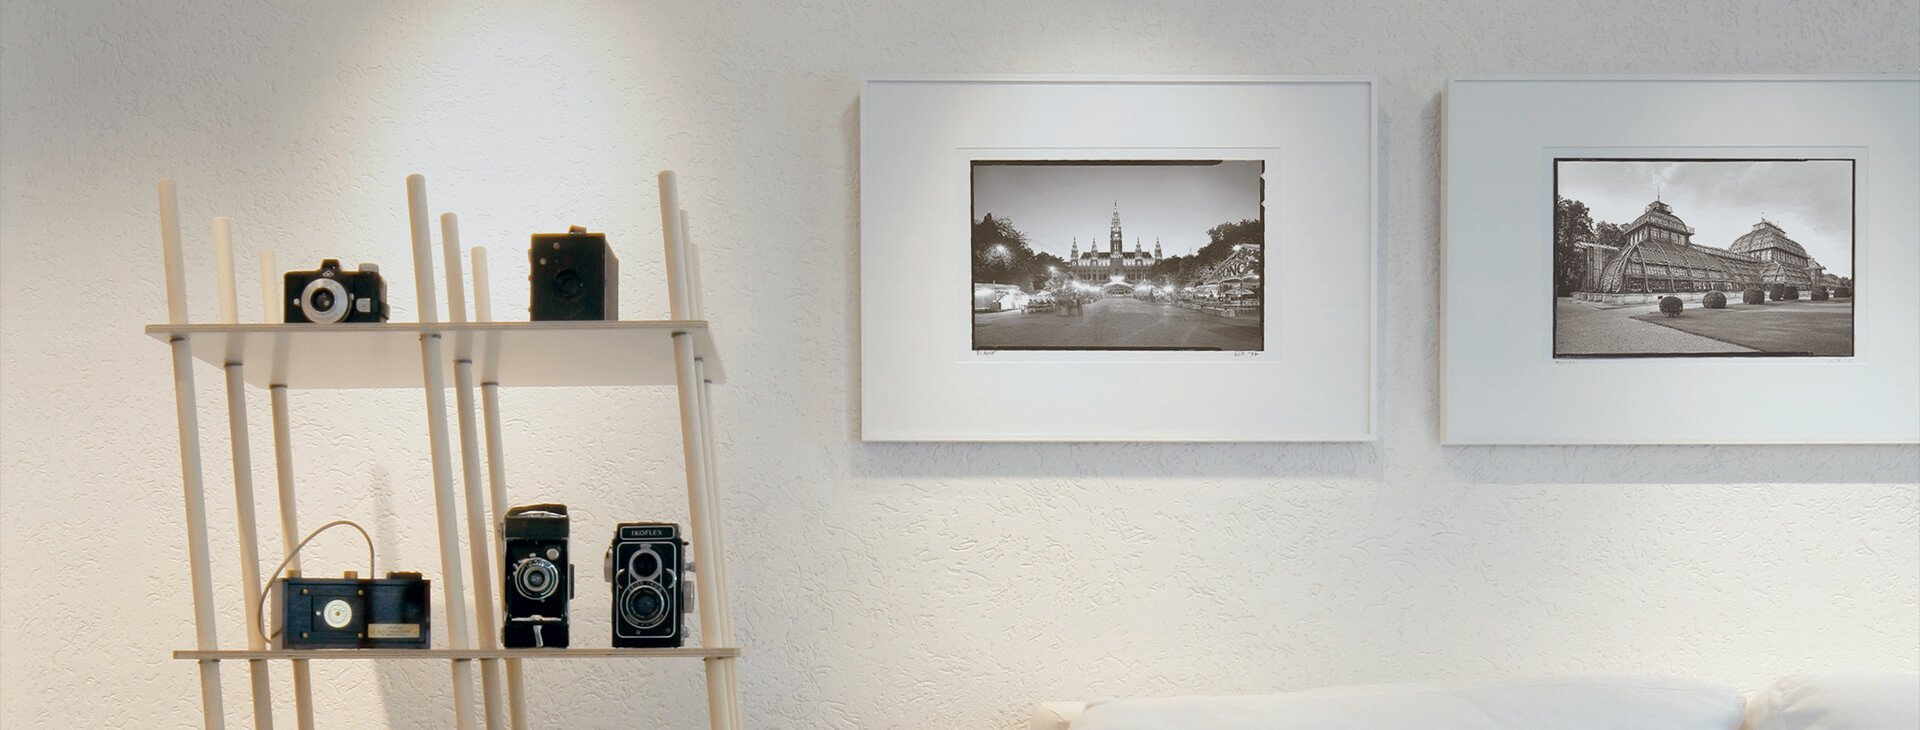 einefragedesdesigns nils holger moormann stilwerk news. Black Bedroom Furniture Sets. Home Design Ideas